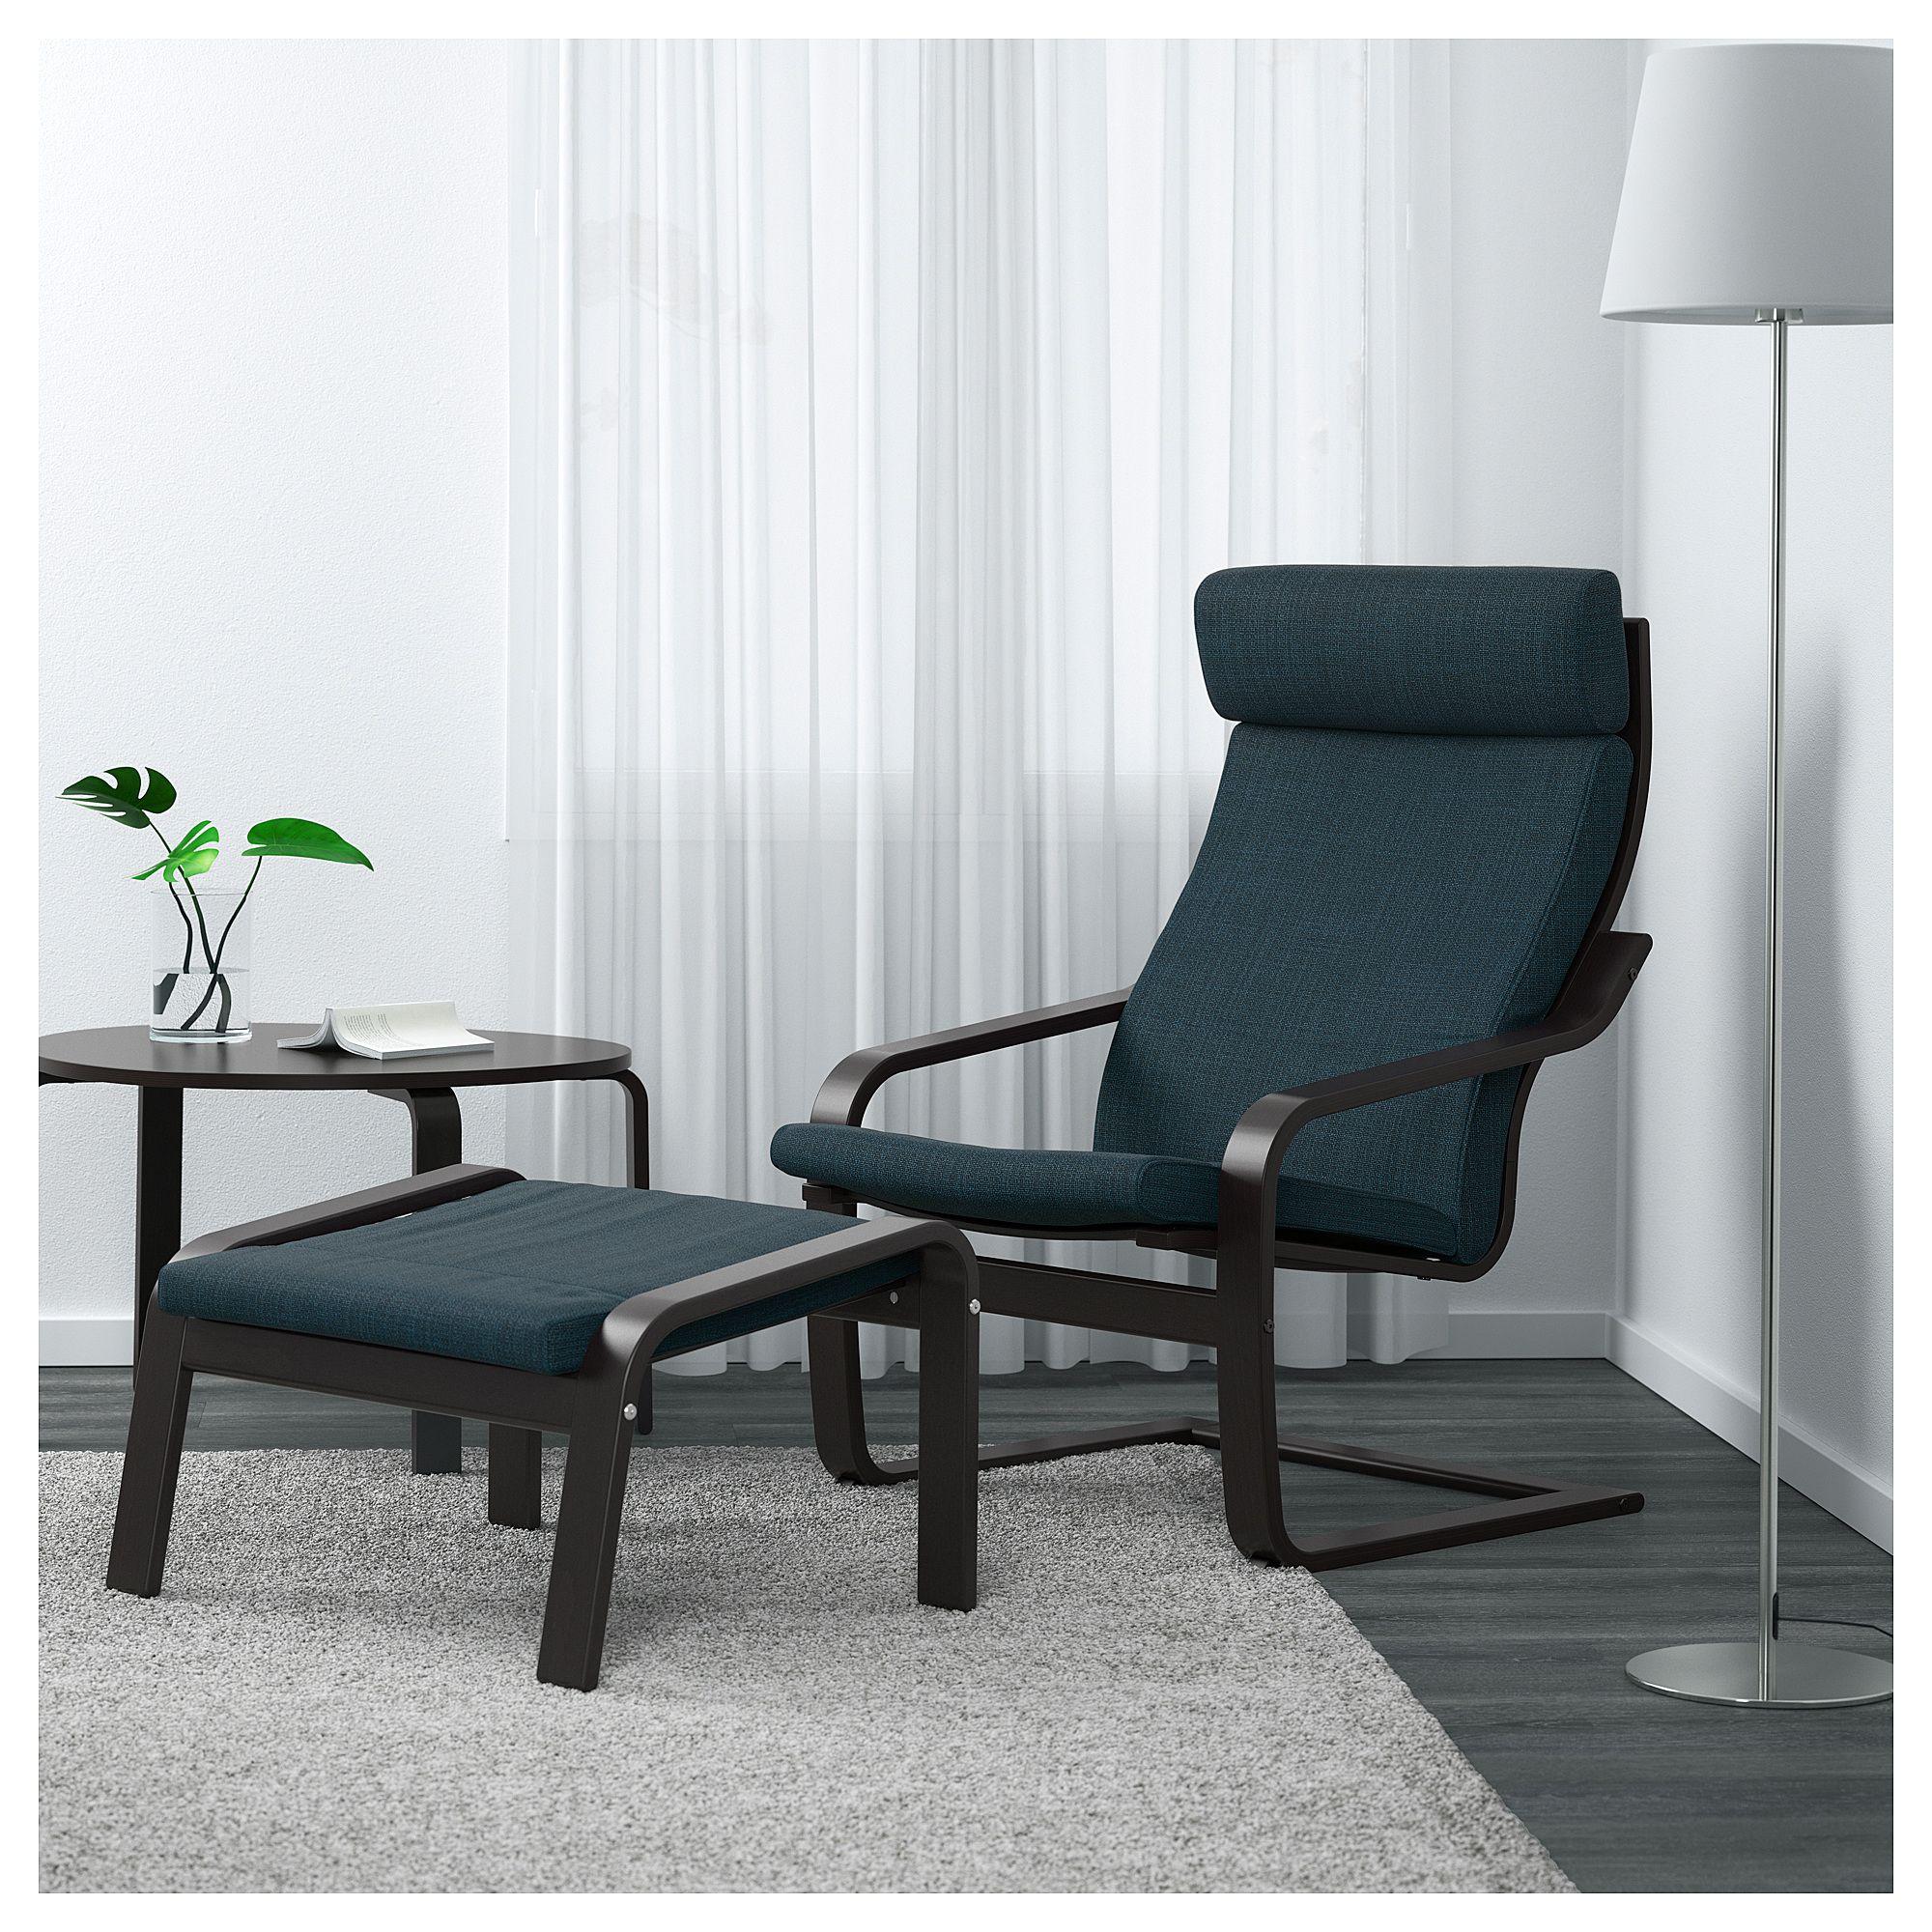 Furniture And Home Furnishings Furniture Ikea Chair Cushions